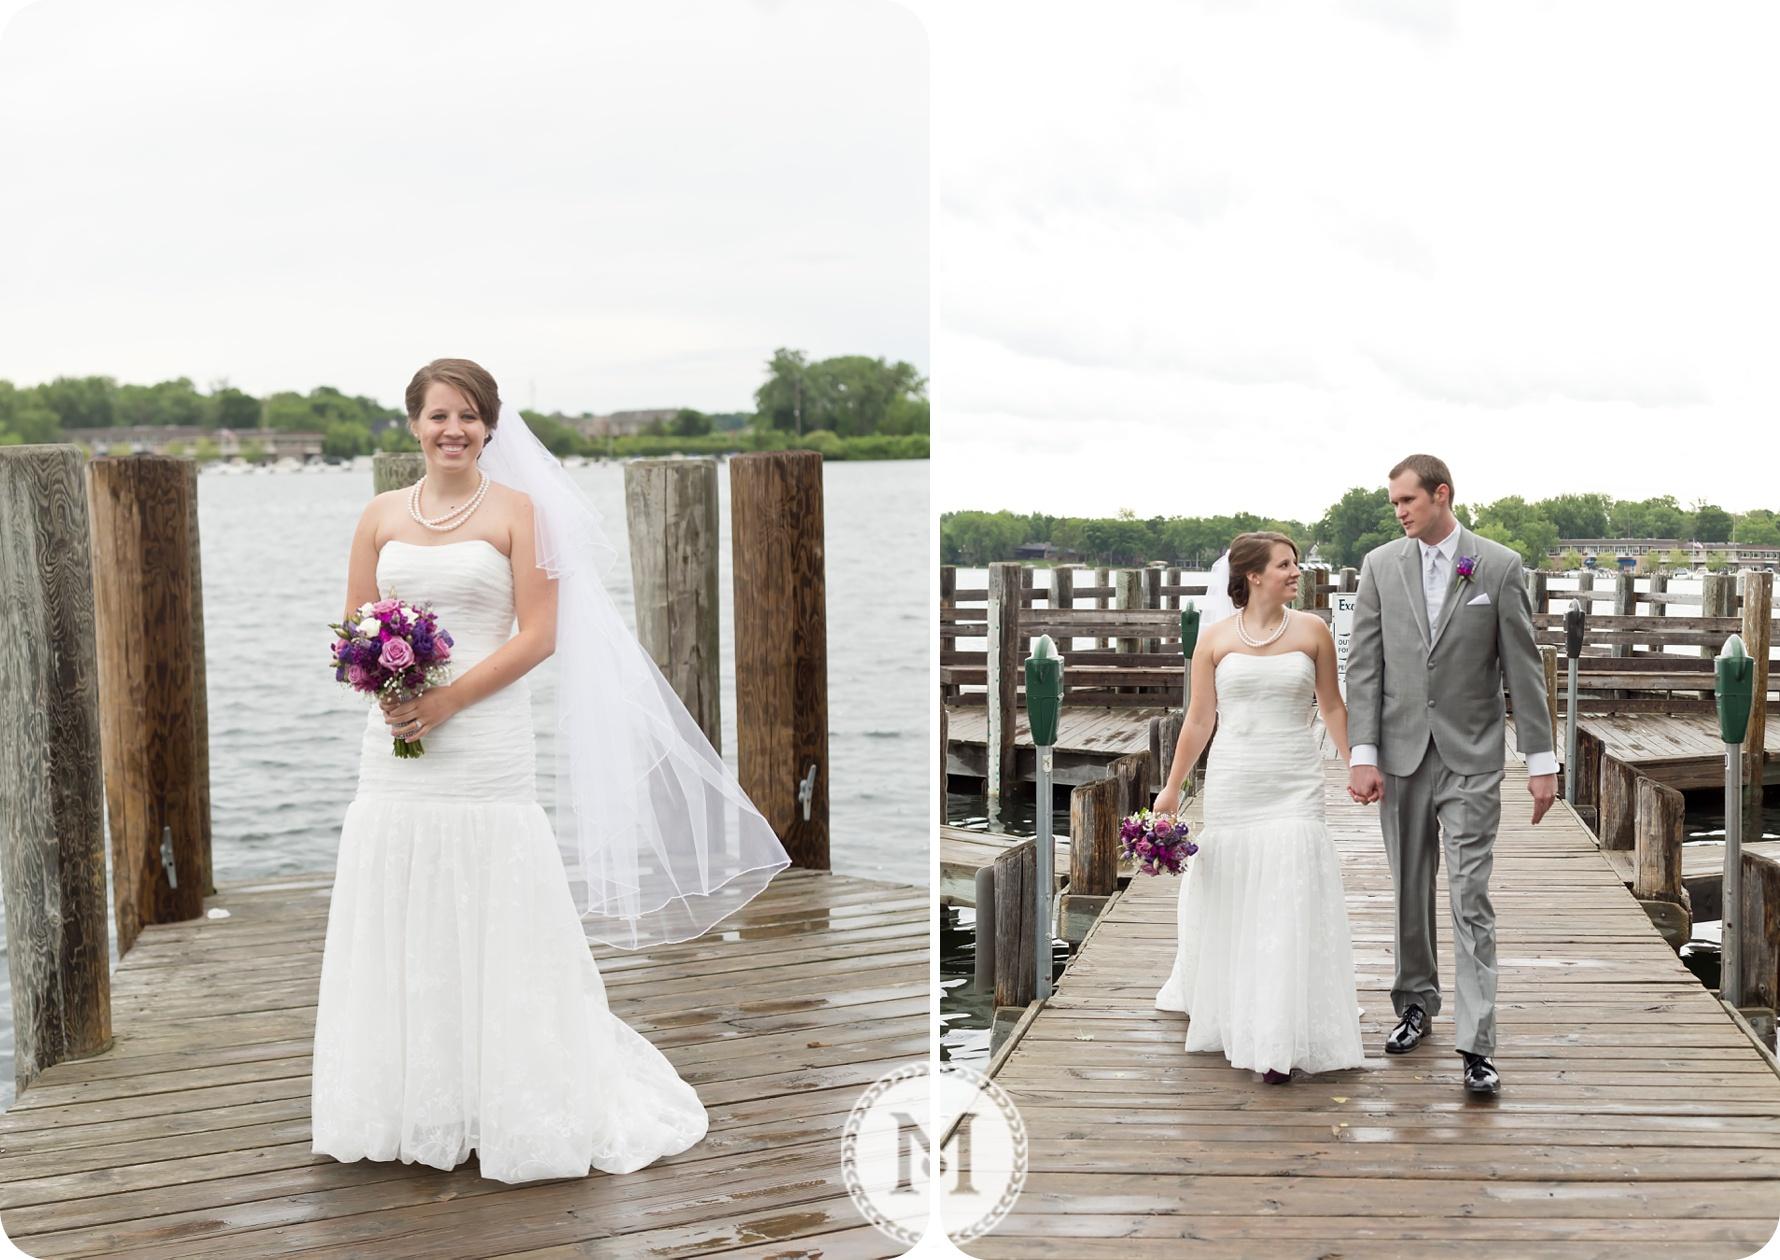 mckenziesmithphotography.com_0229